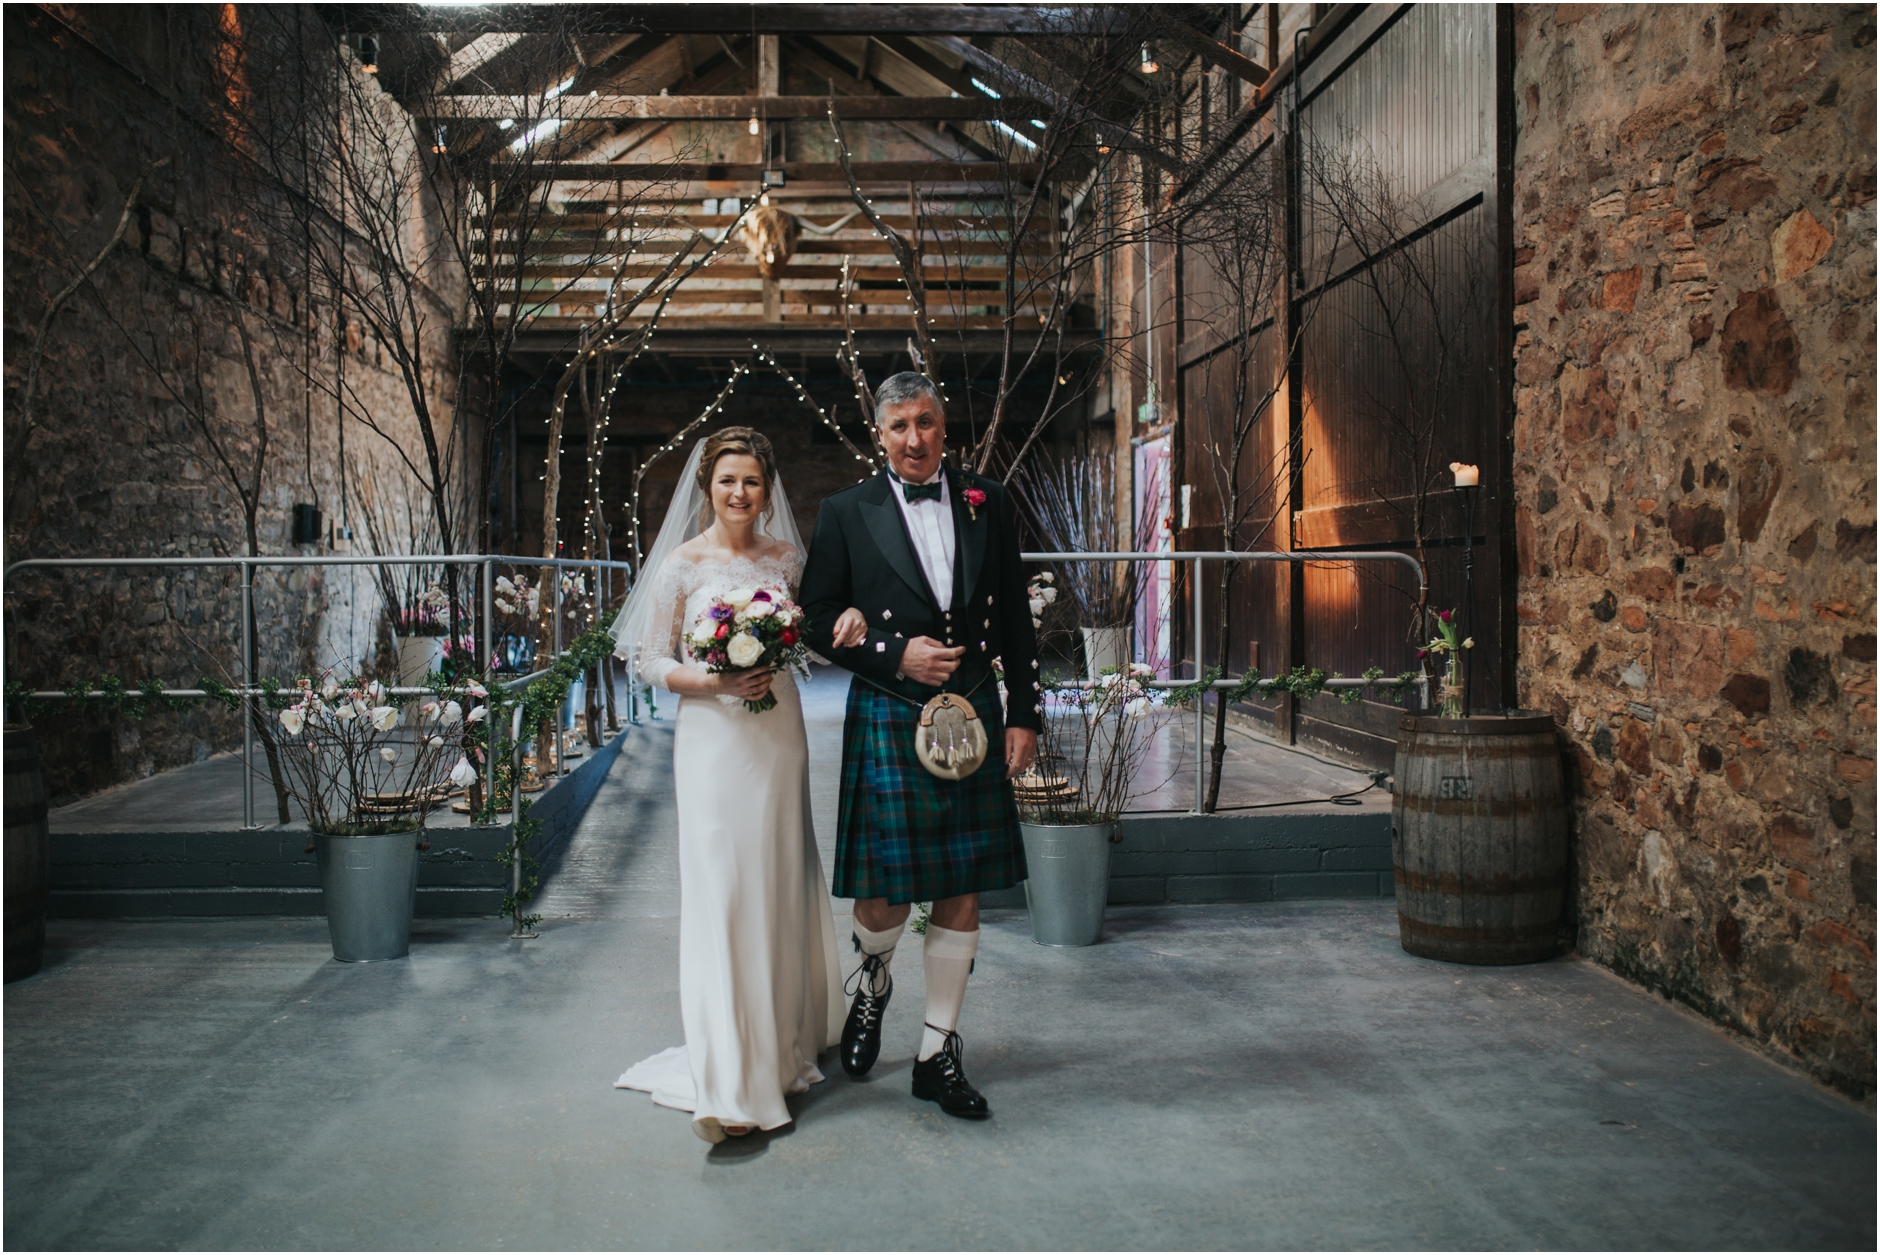 Edinburgh scotland wedding photographer best of 2018 2017Edinburgh scotland wedding photographer best of 2018 2017